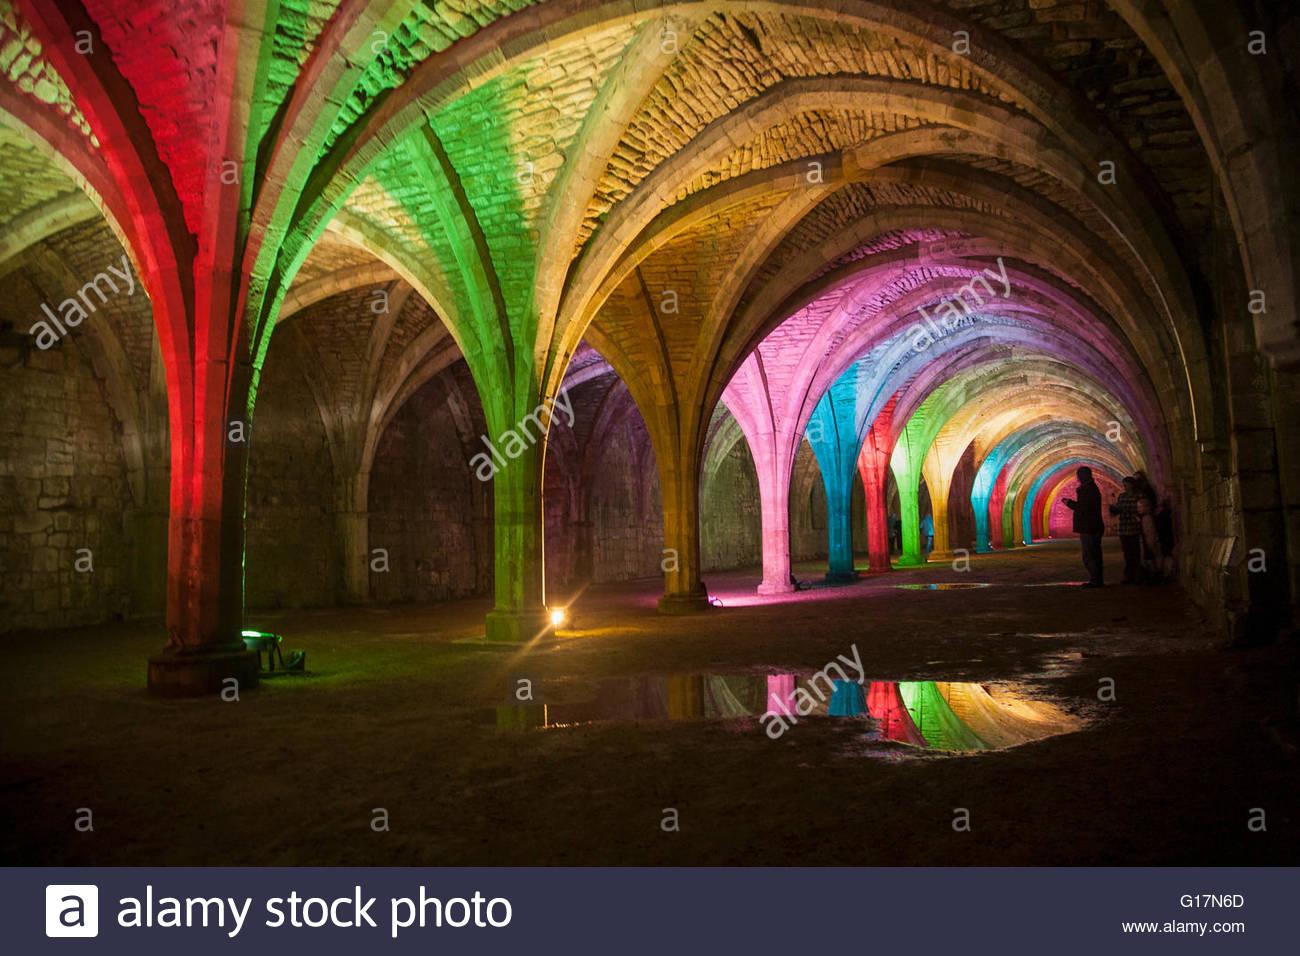 The Cellarium, Fountains Abbey, Ripon, Yorkshire - Stock Image